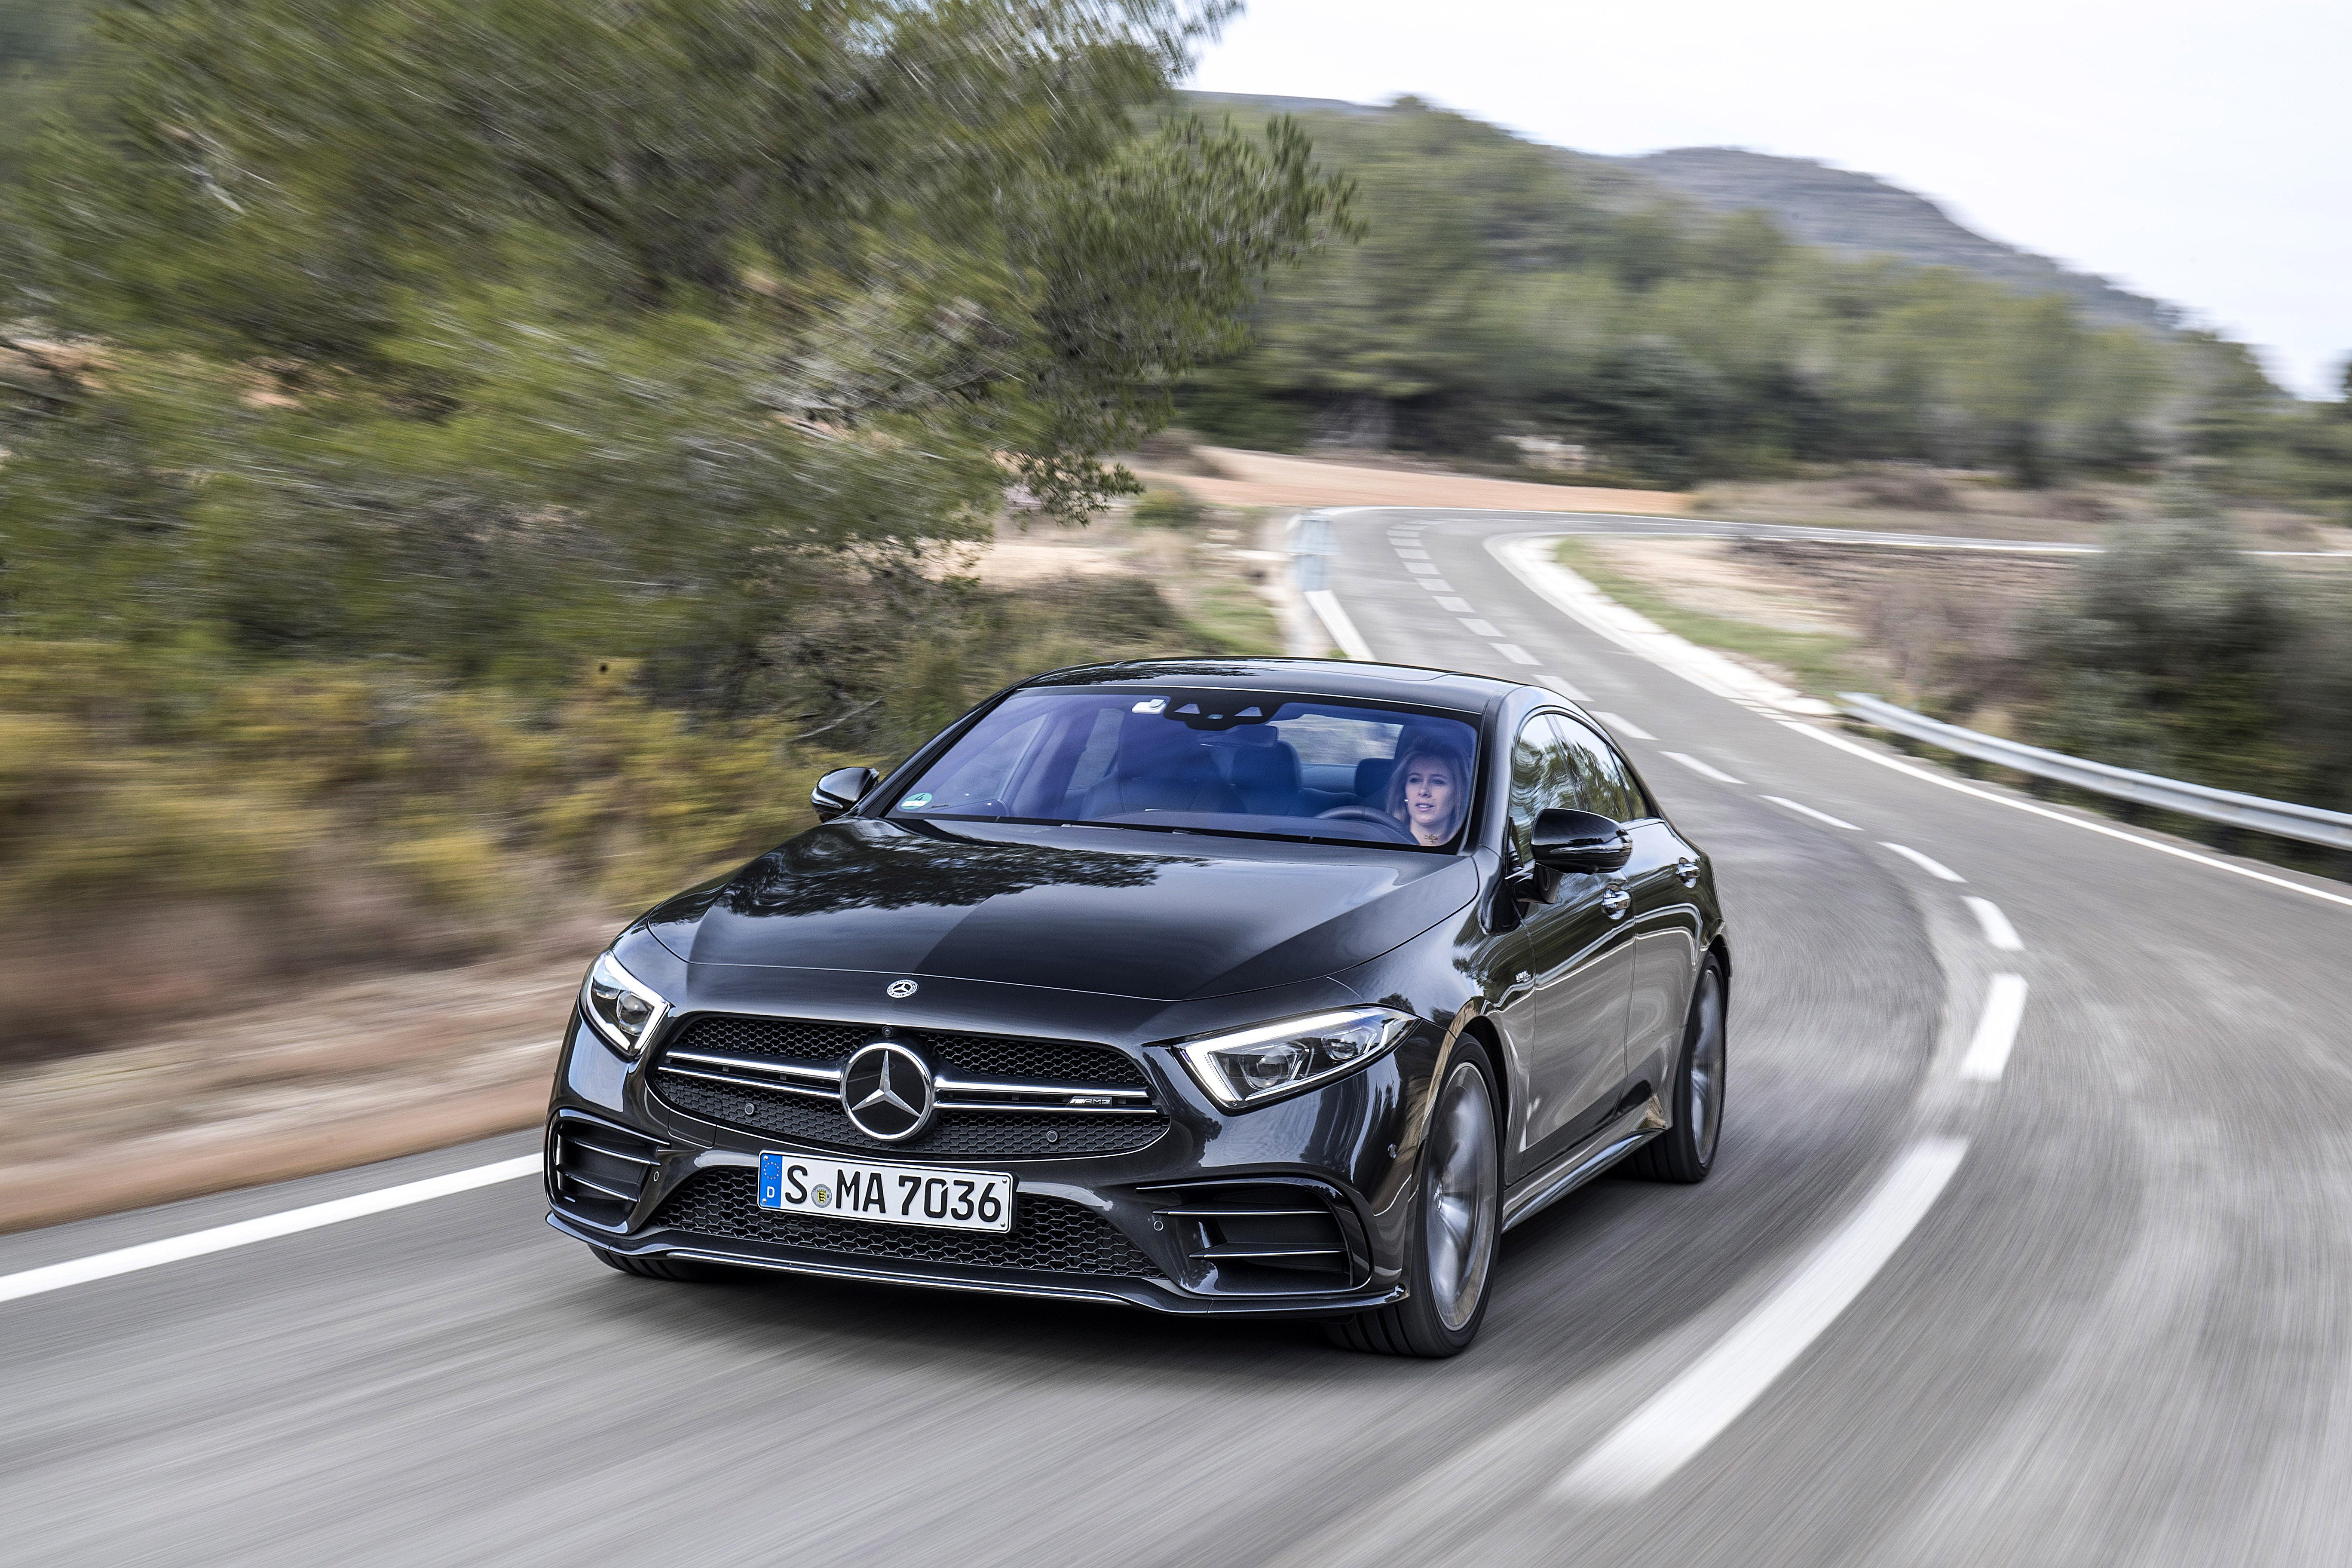 2018 Mercedes-AMG CLS53.